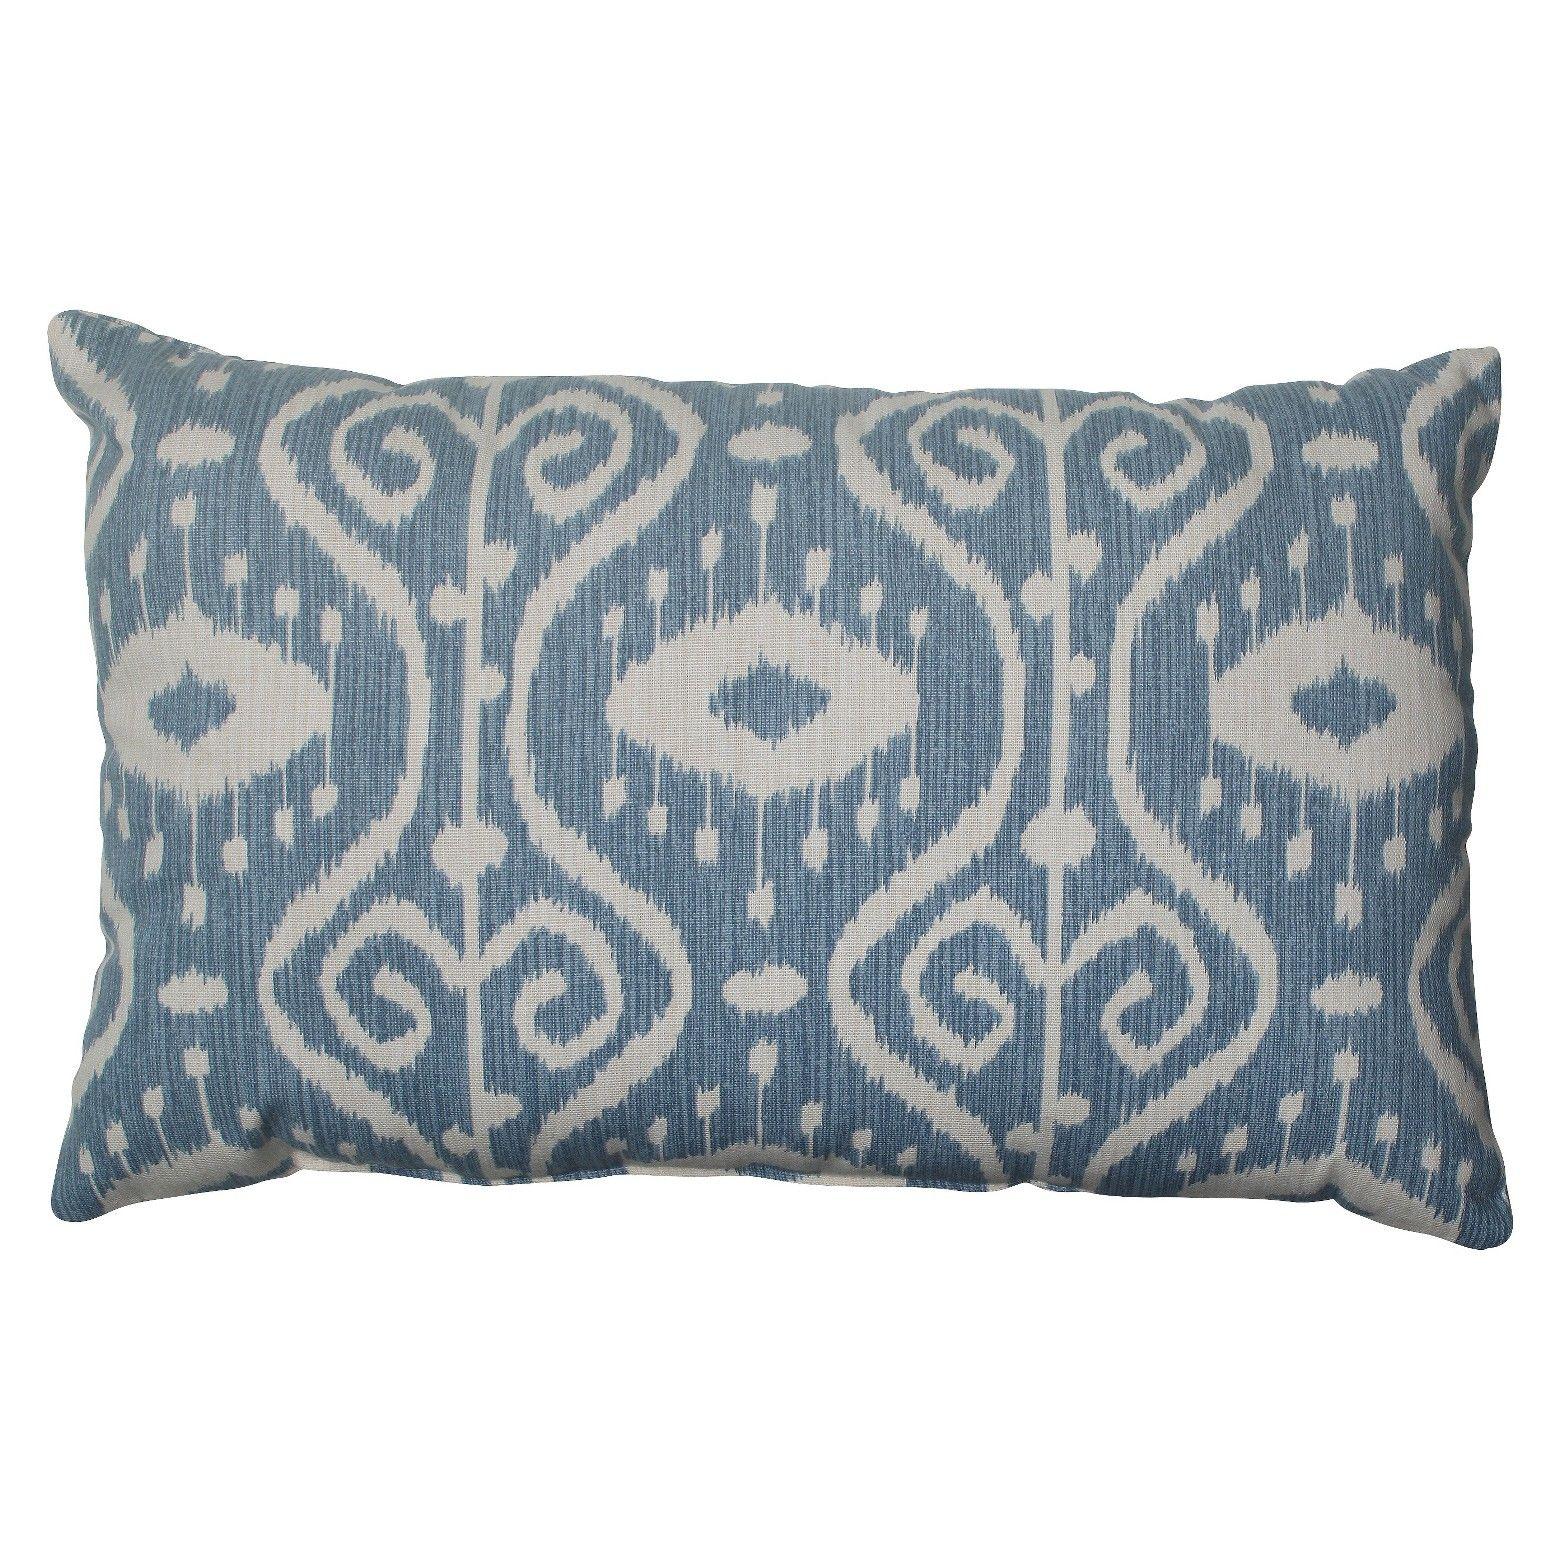 Pillow Perfect Empire Throw Pillow Blue  Pillow Perfect -